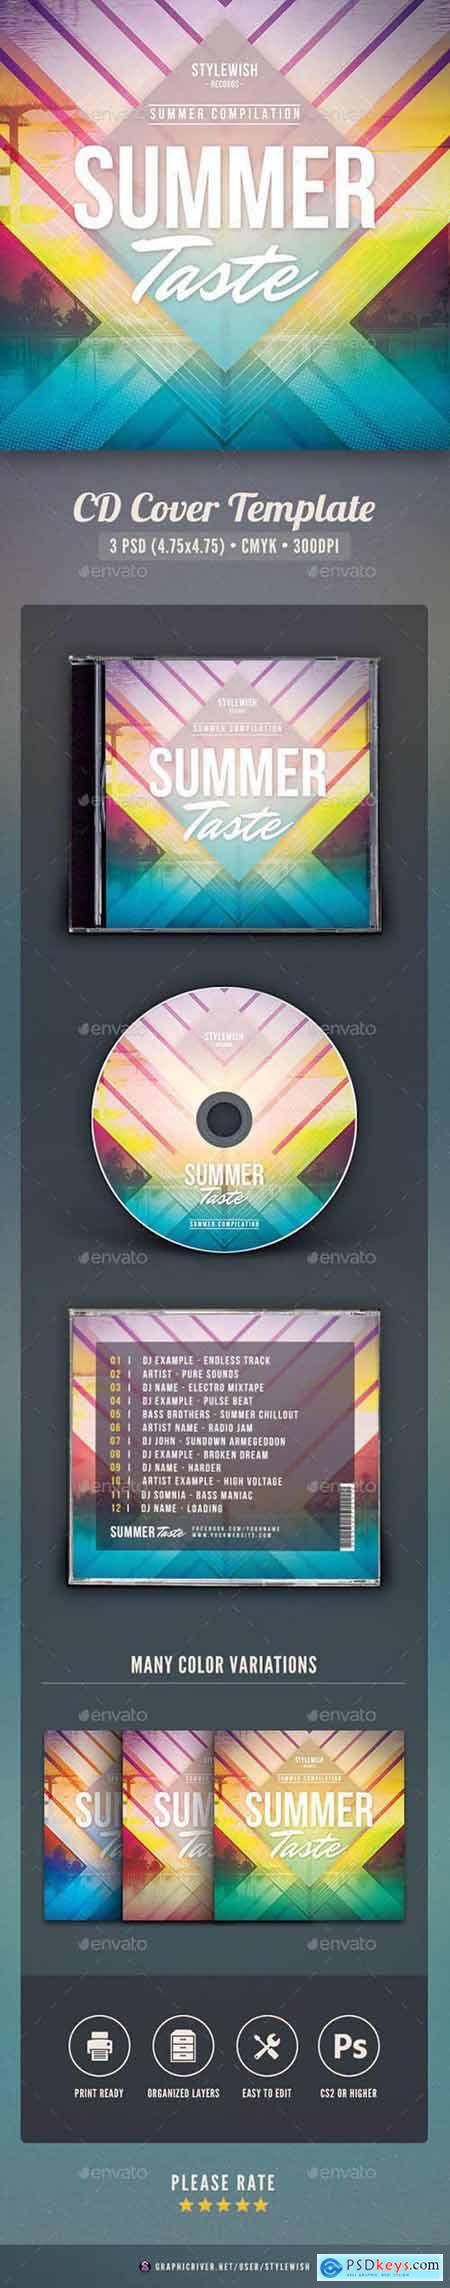 Graphicriver Summer Taste CD Cover Artwork